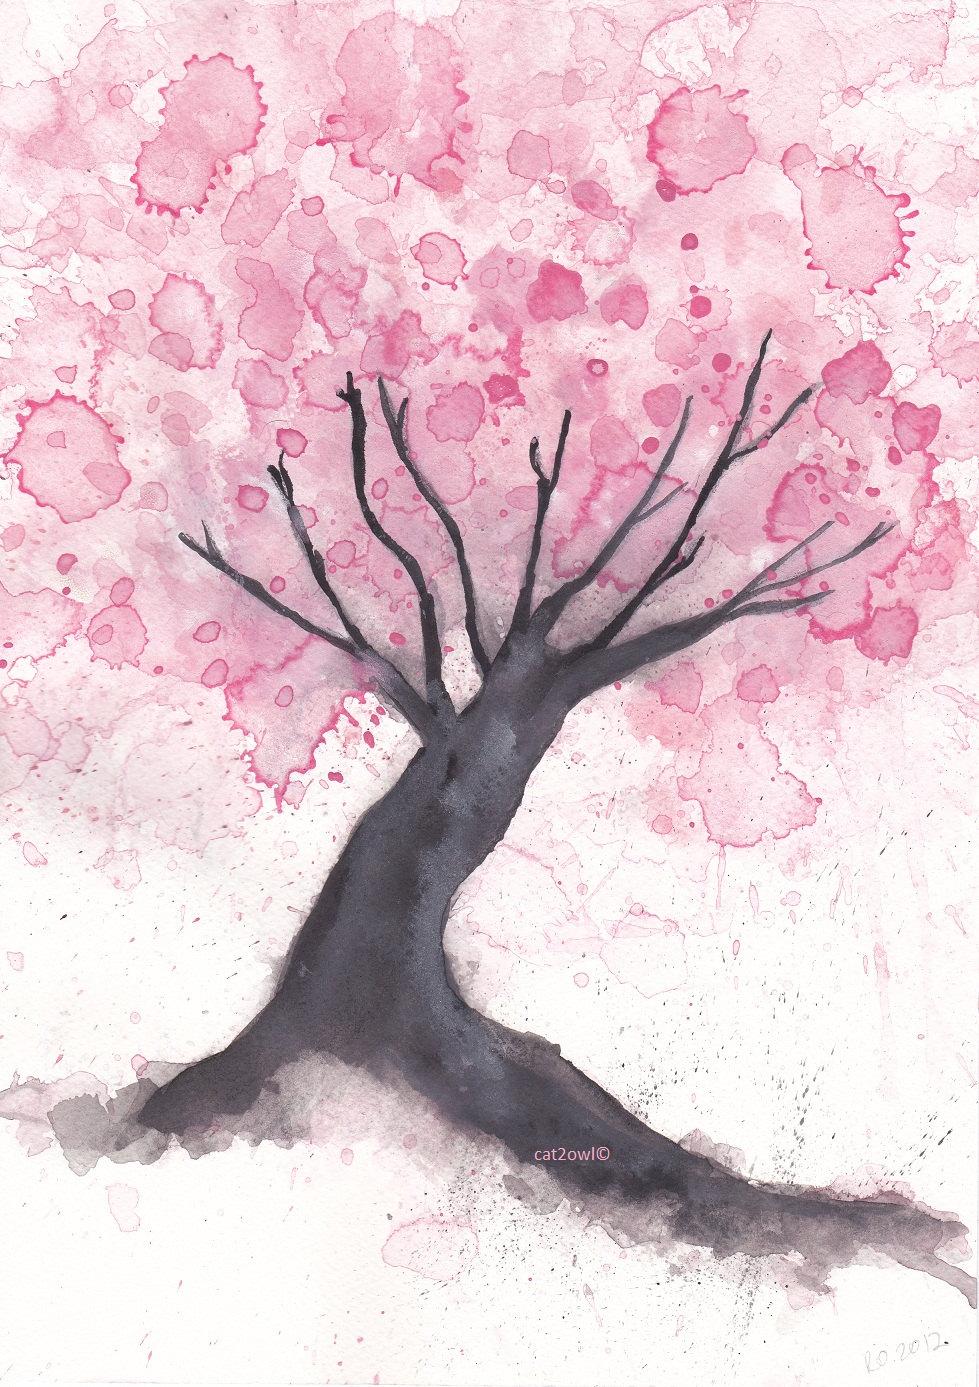 Drawn sakura blossom flowering tree Cherry > For For Drawing